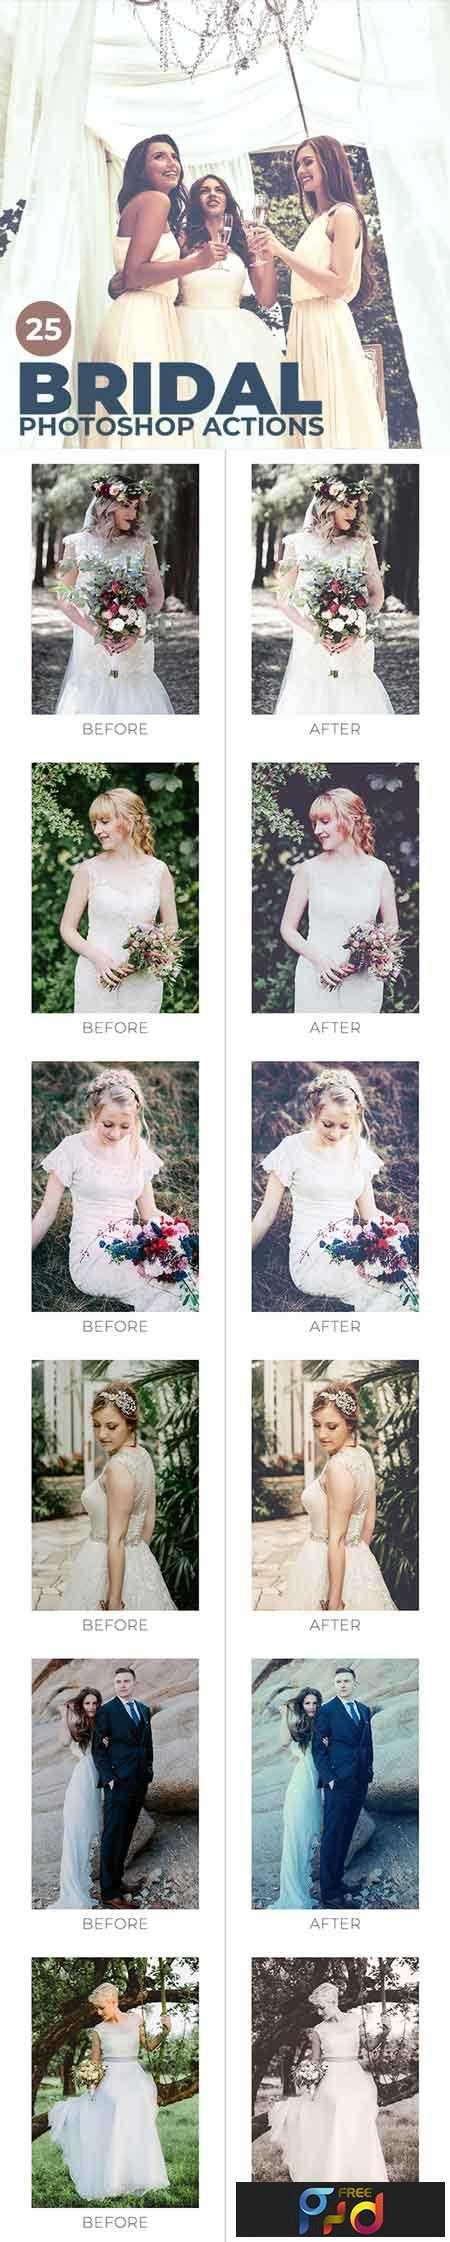 1807053 25 Bridal Photoshop Actions 22082649 1